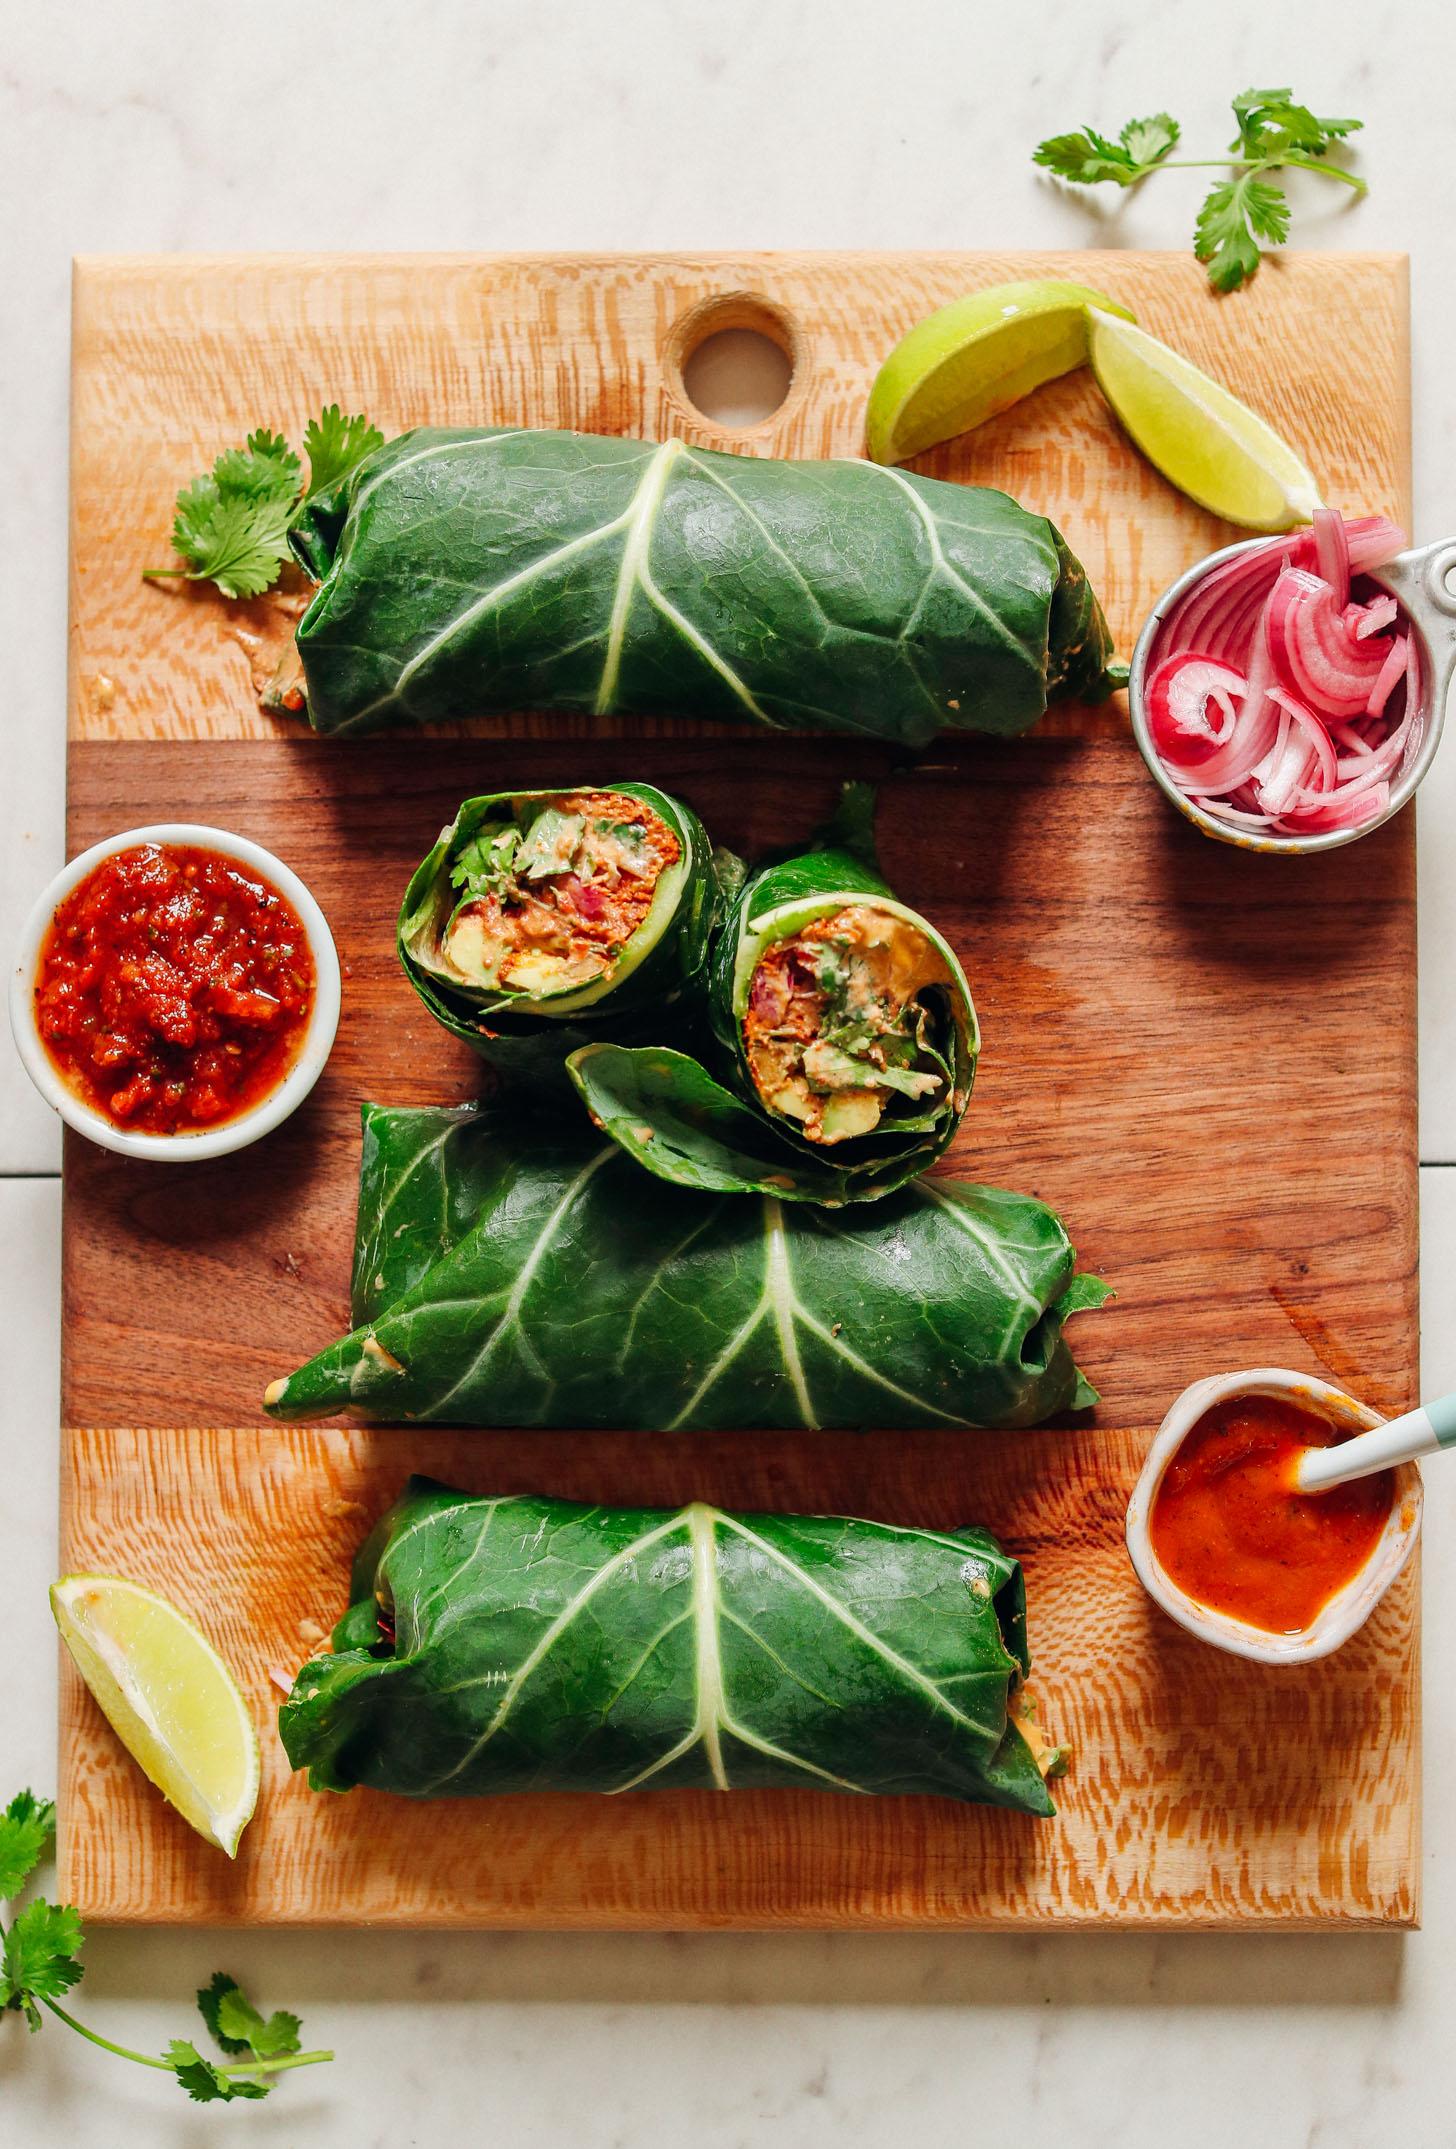 FRESH-Raw-Vegan-Burritos-with-Vegan-Taco-Meat-avocado-and-Vegan-Queso-30-minutes-8-ingredients-BIG-flavor-vegan-glutenfree-mexicanfood-recipe-burrito-7.jpg